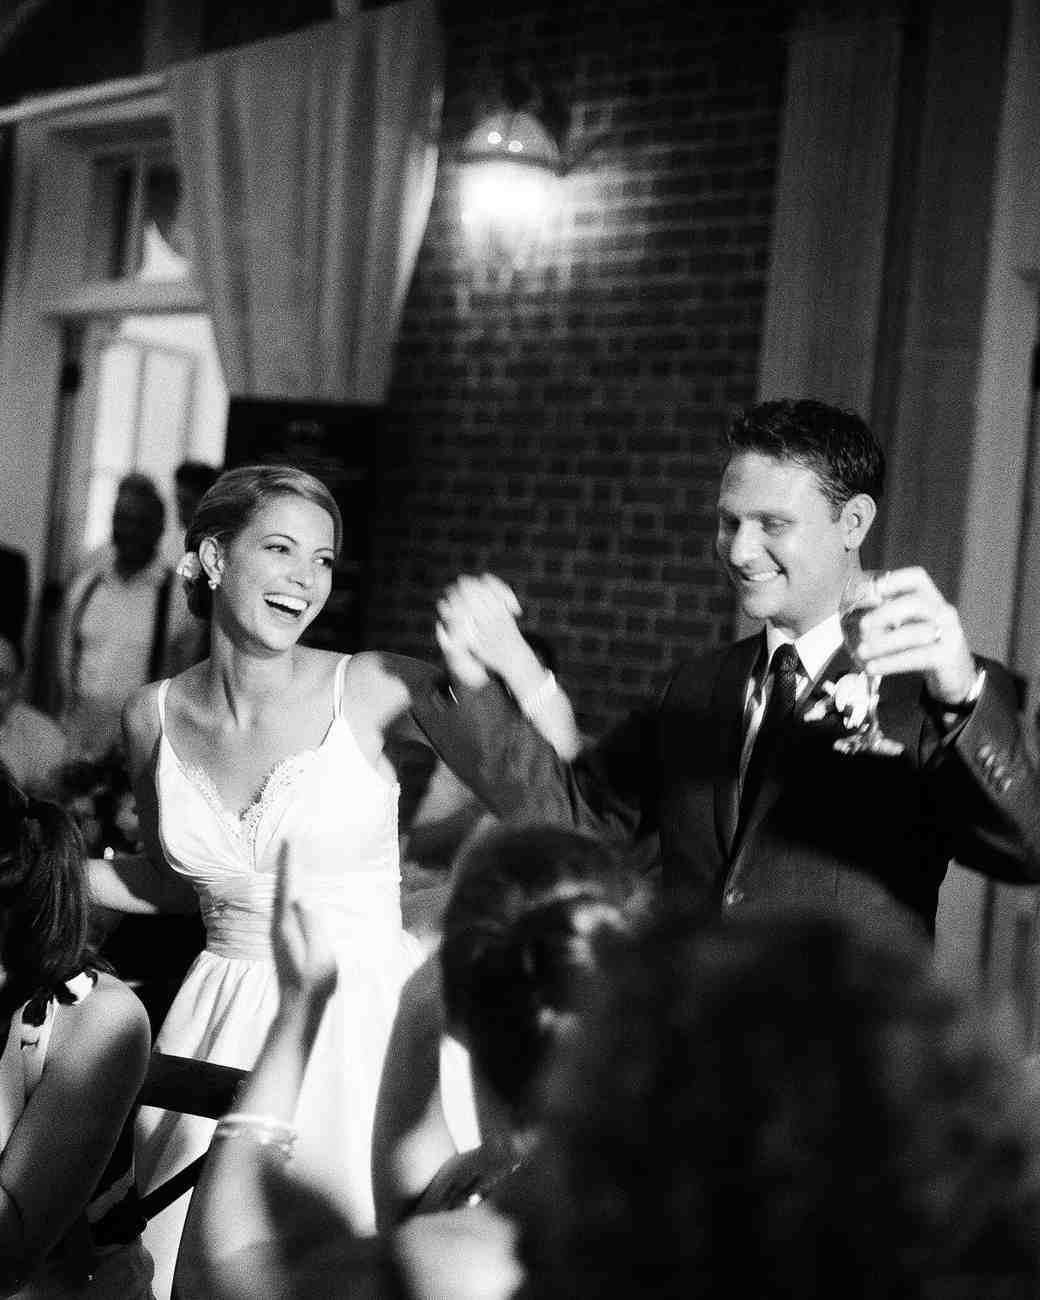 beth-scott-wedding-toast-0726-s112077-0715.jpg